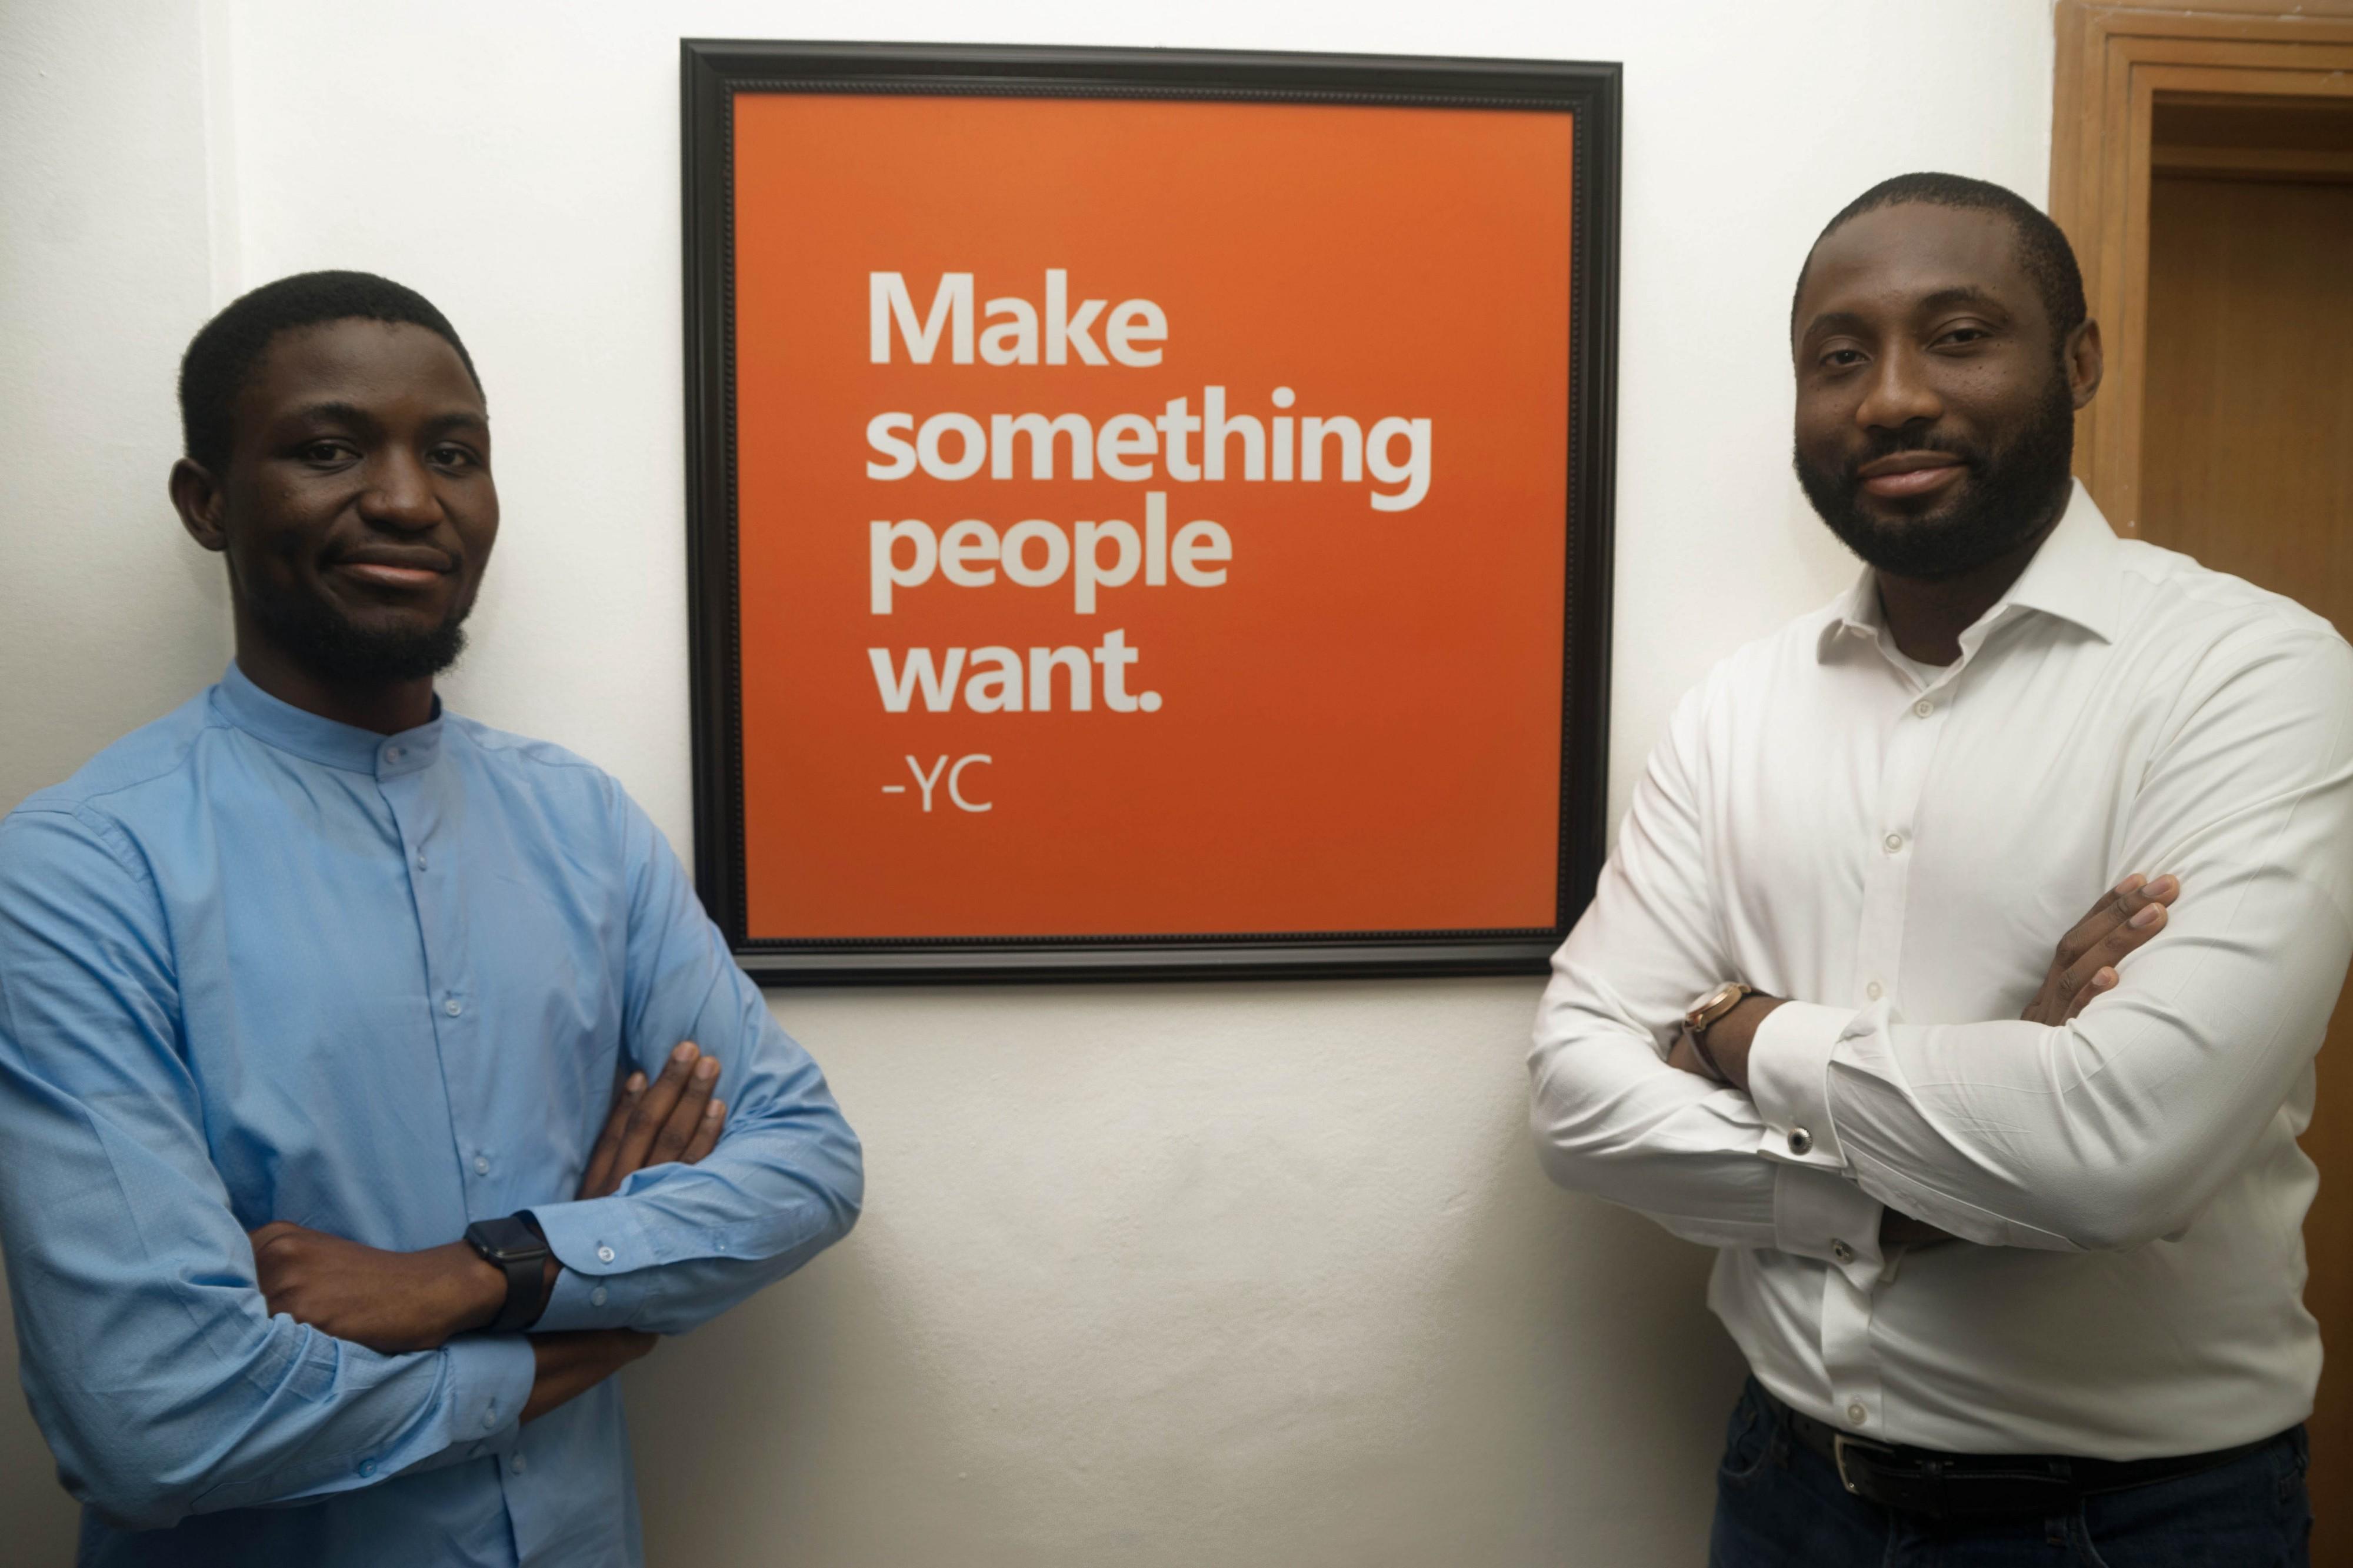 Aella co-founders, Akanbi Wale and Akinola Jones